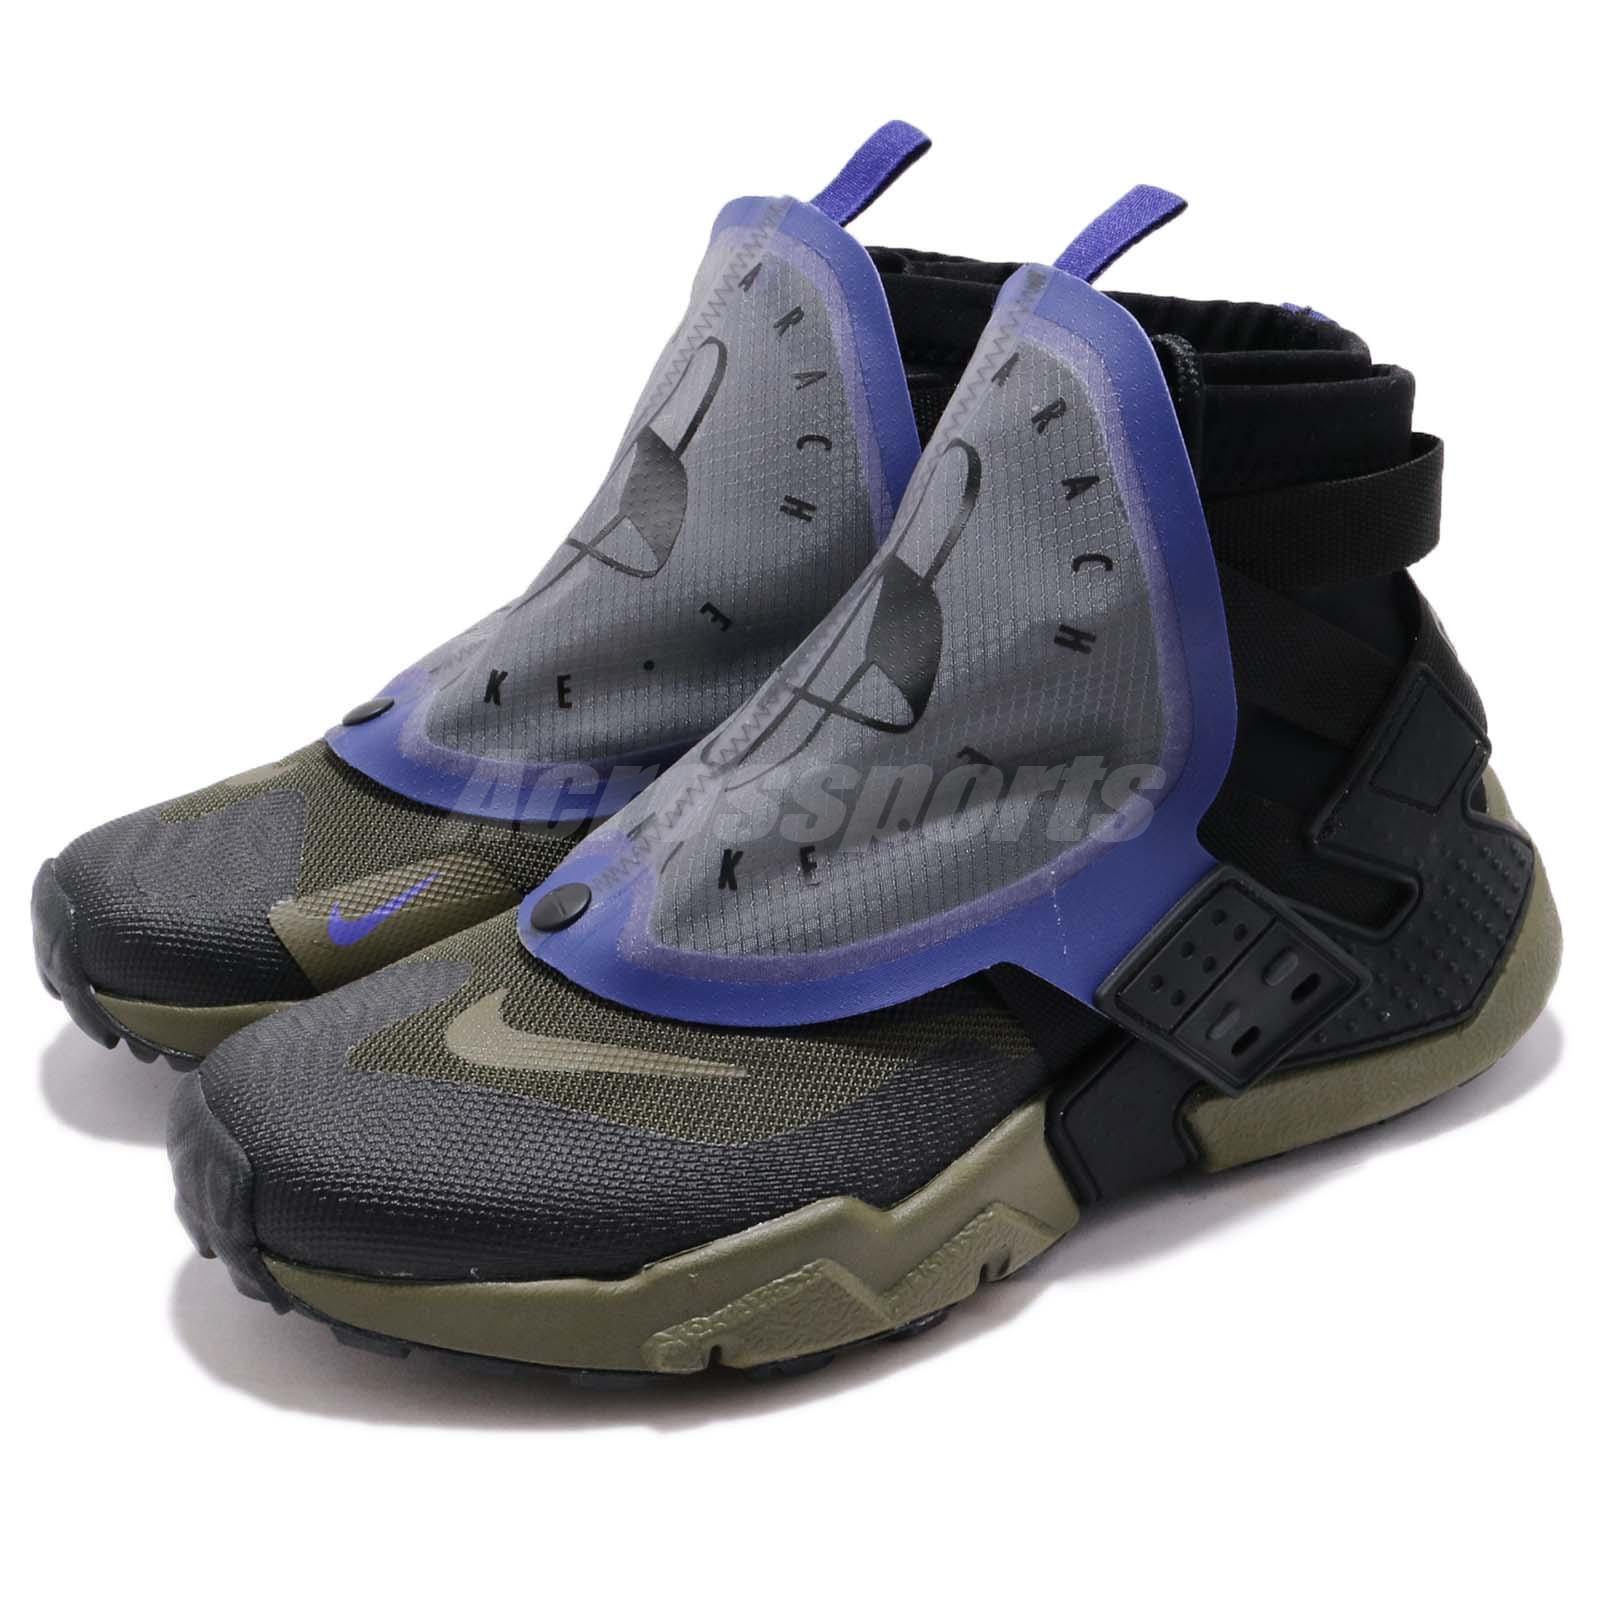 Nike Air Huarache Gripp QS Black Olive Canvas Zipper Men Running shoes AT0298-001